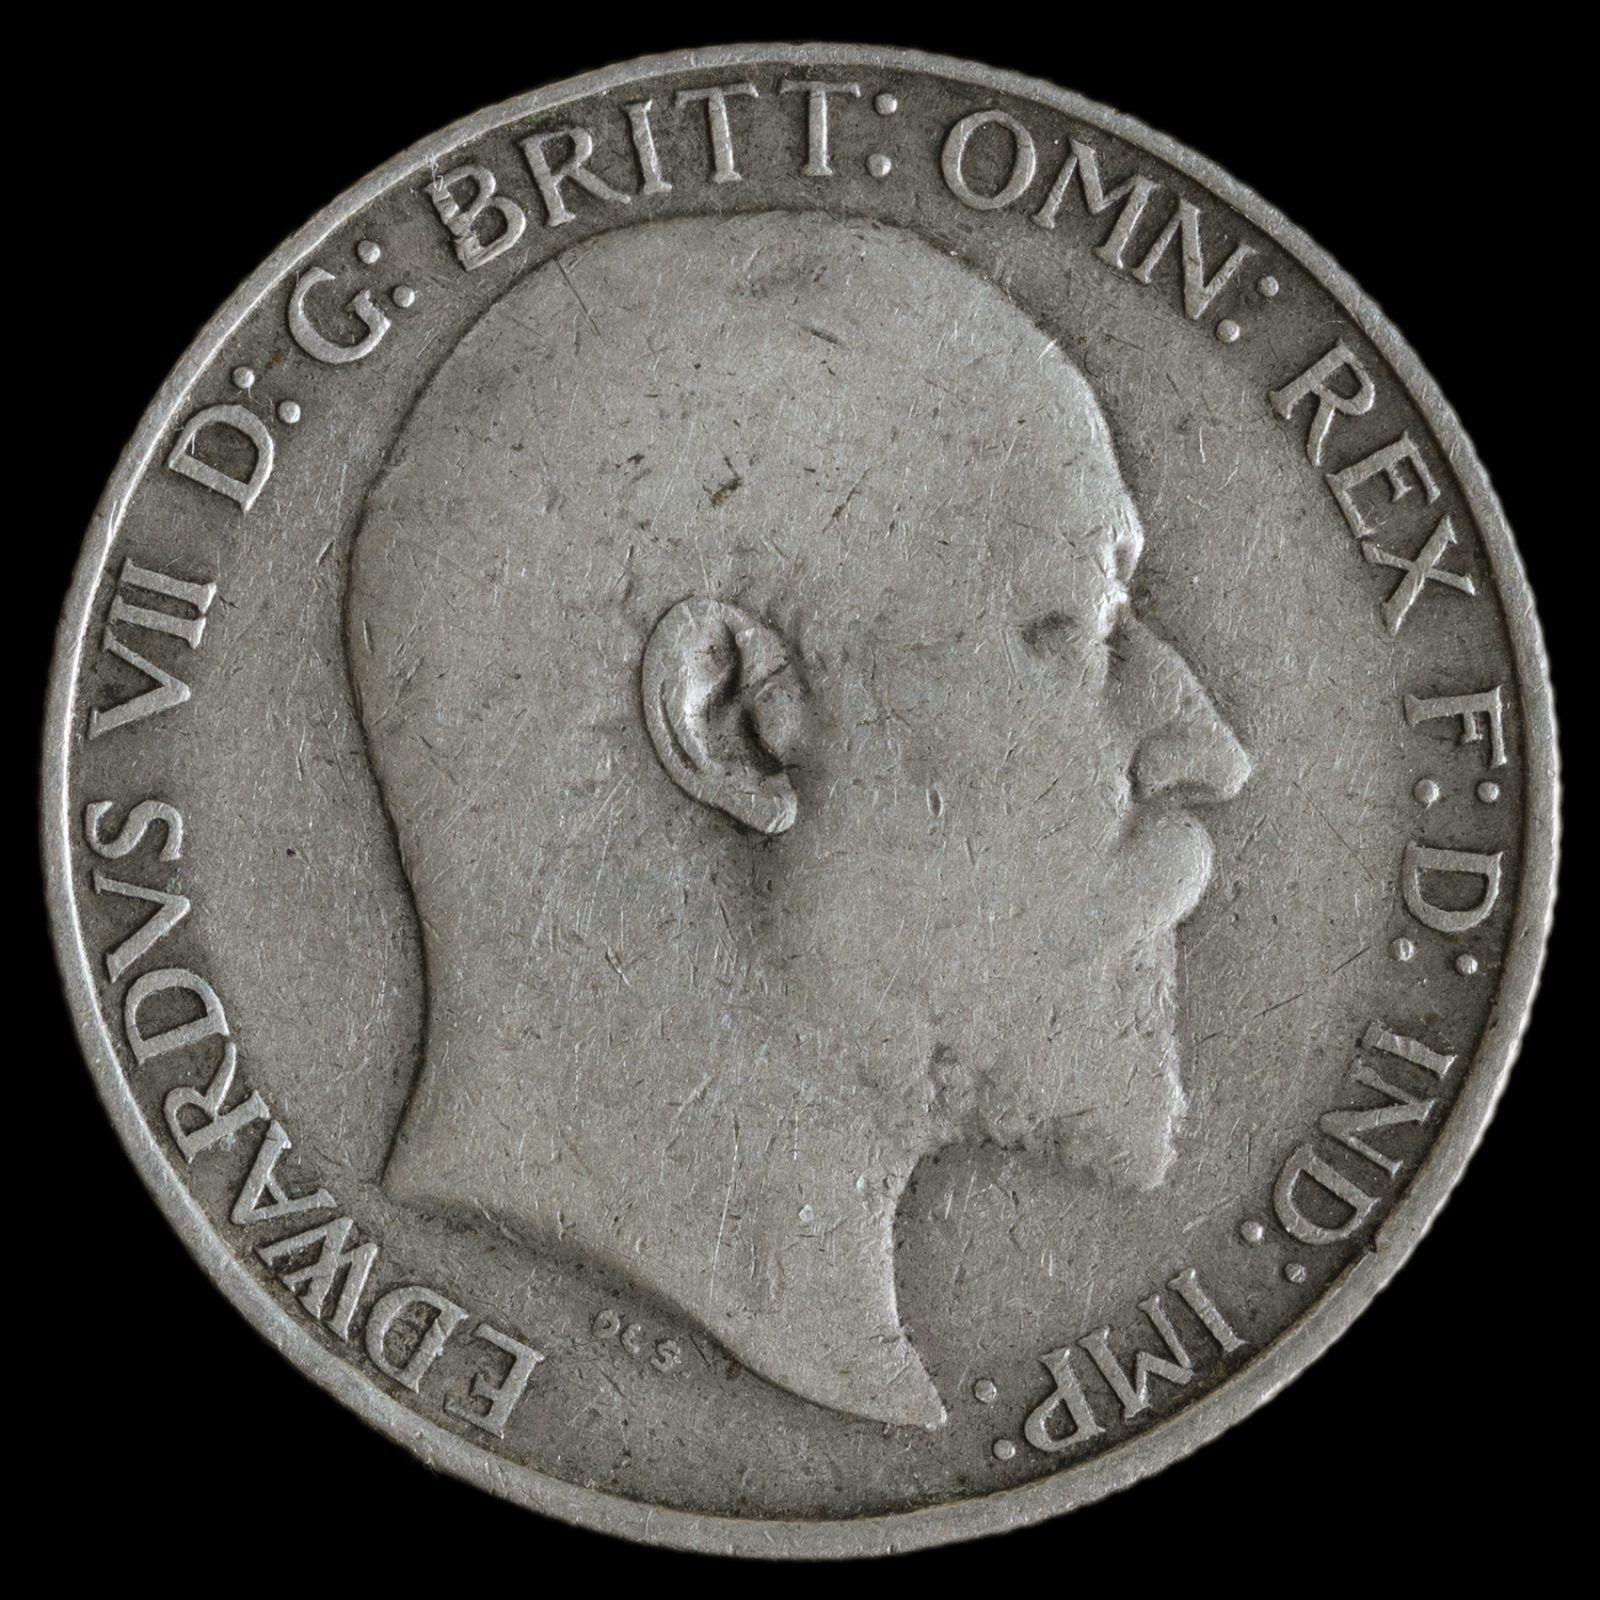 1910 Edward VII Silver Florin